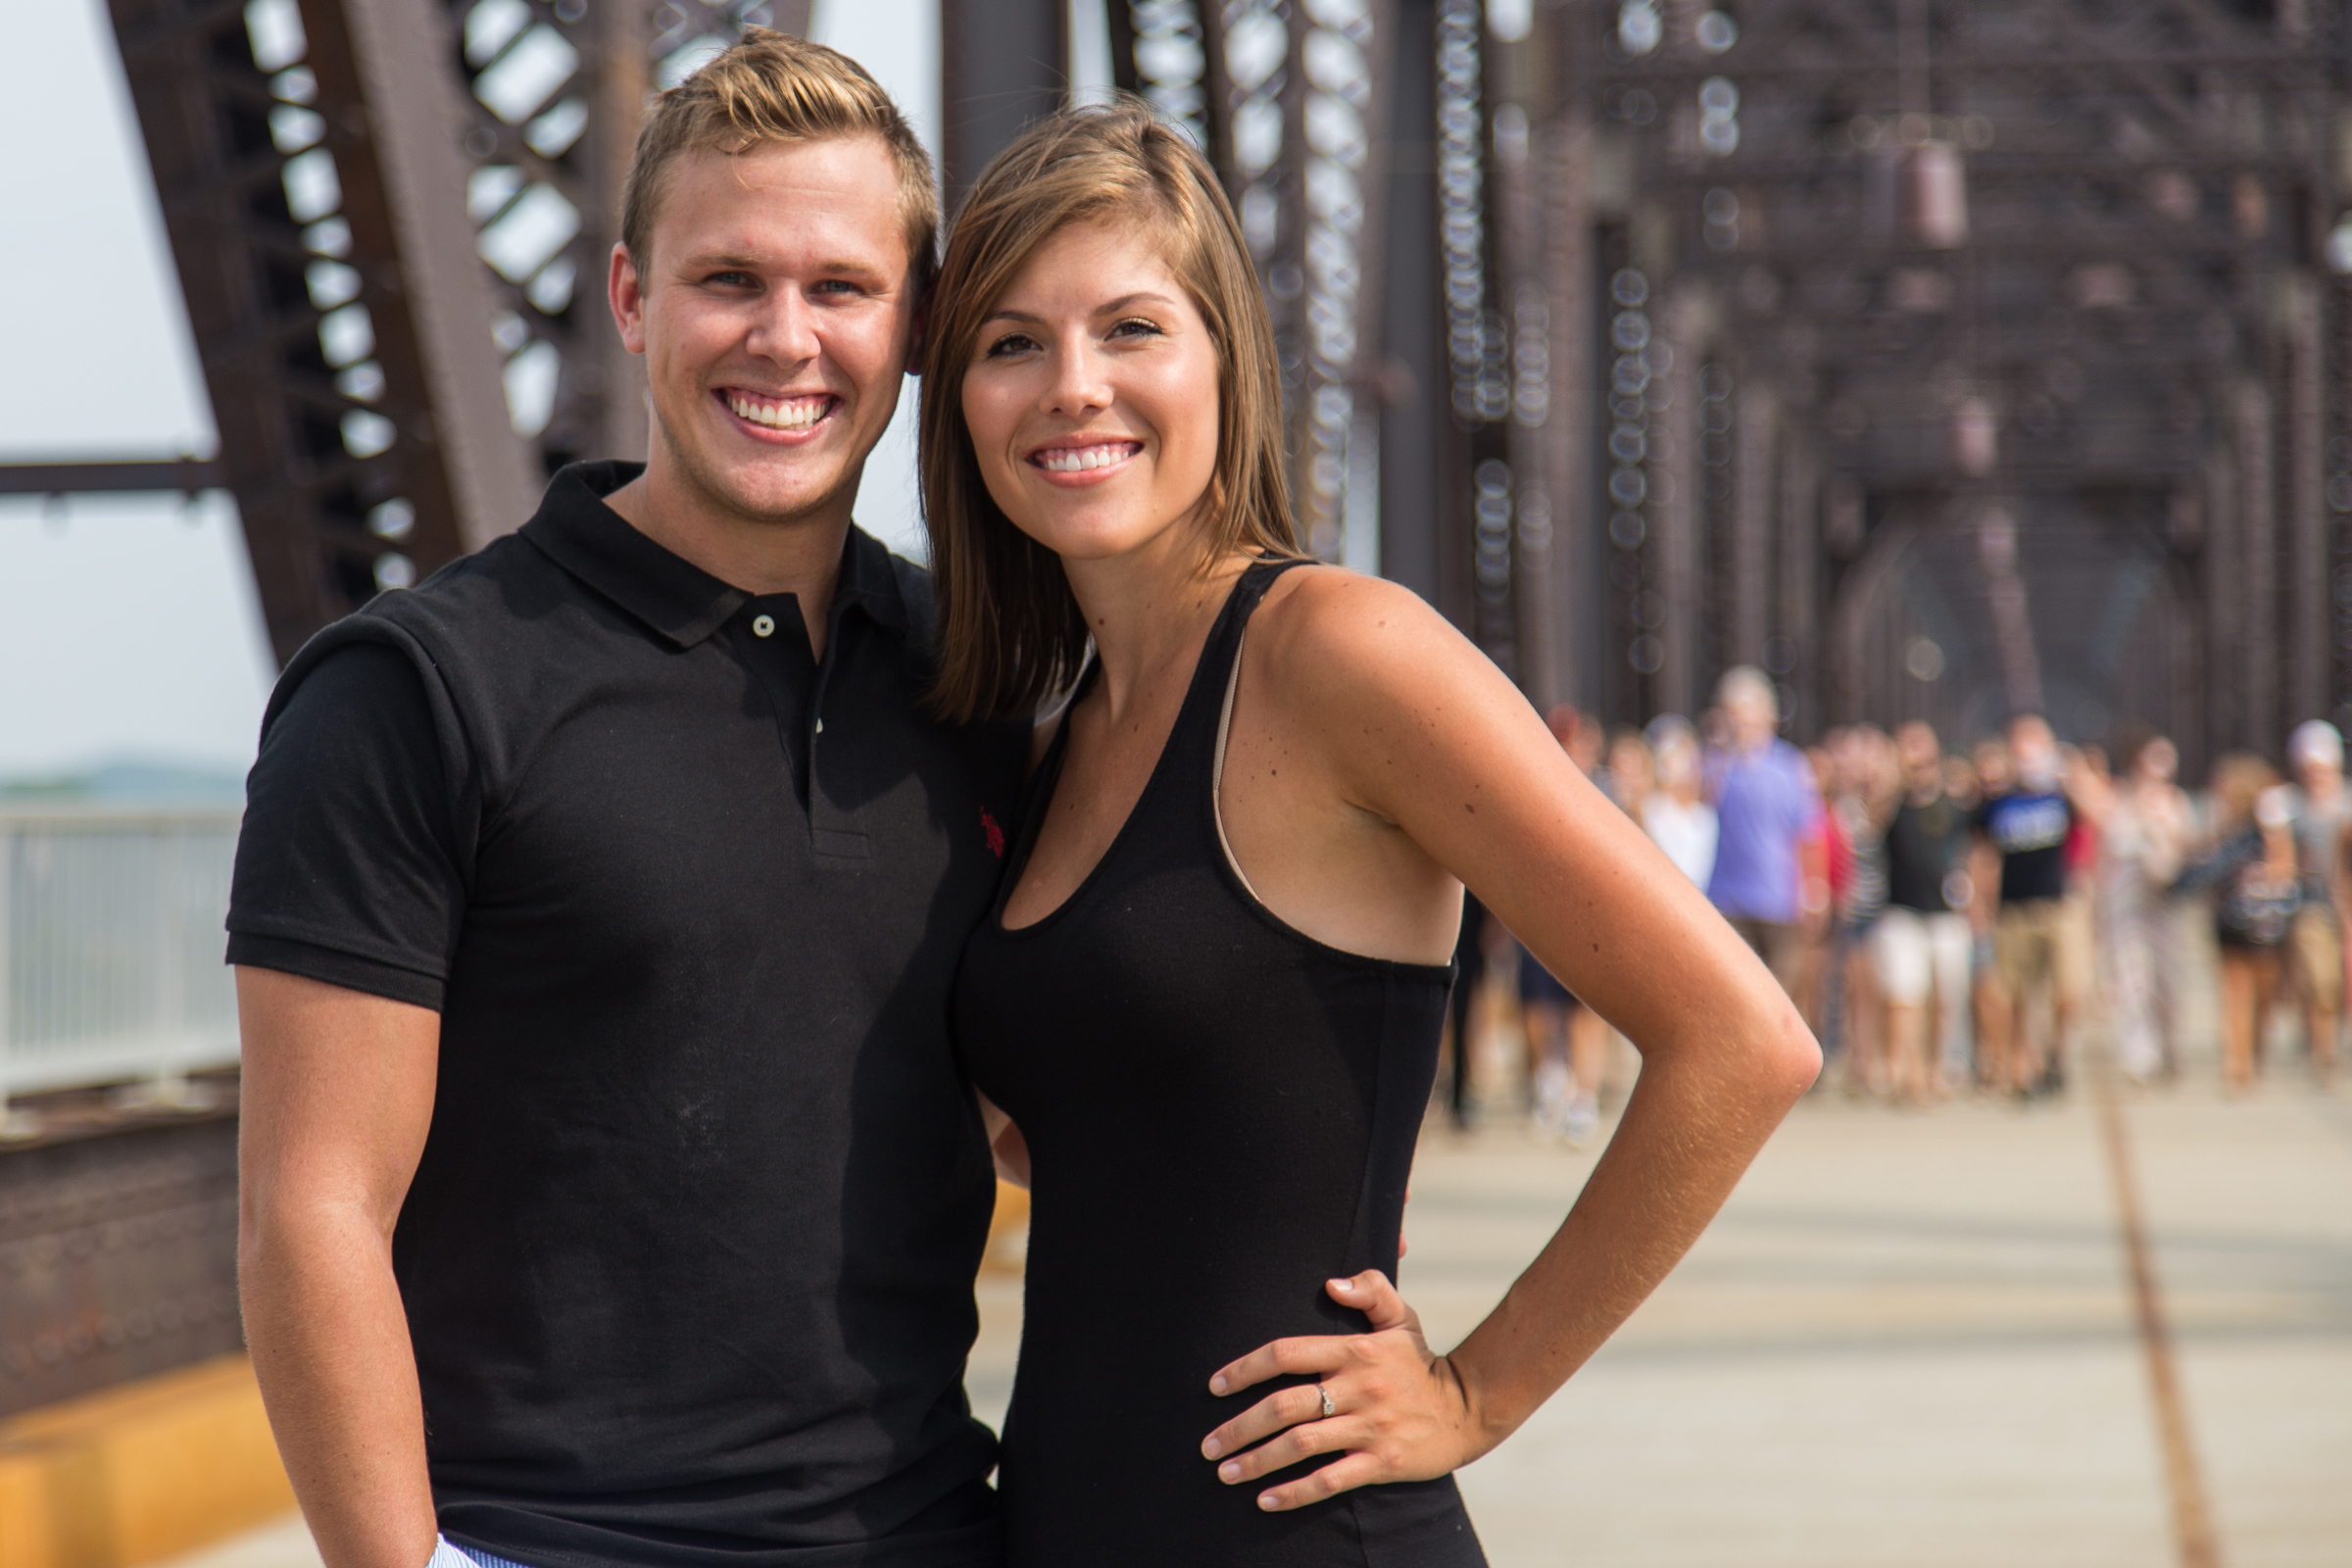 Image 1 of Jessica and Joseph's Walking Bridge Proposal in Louisville